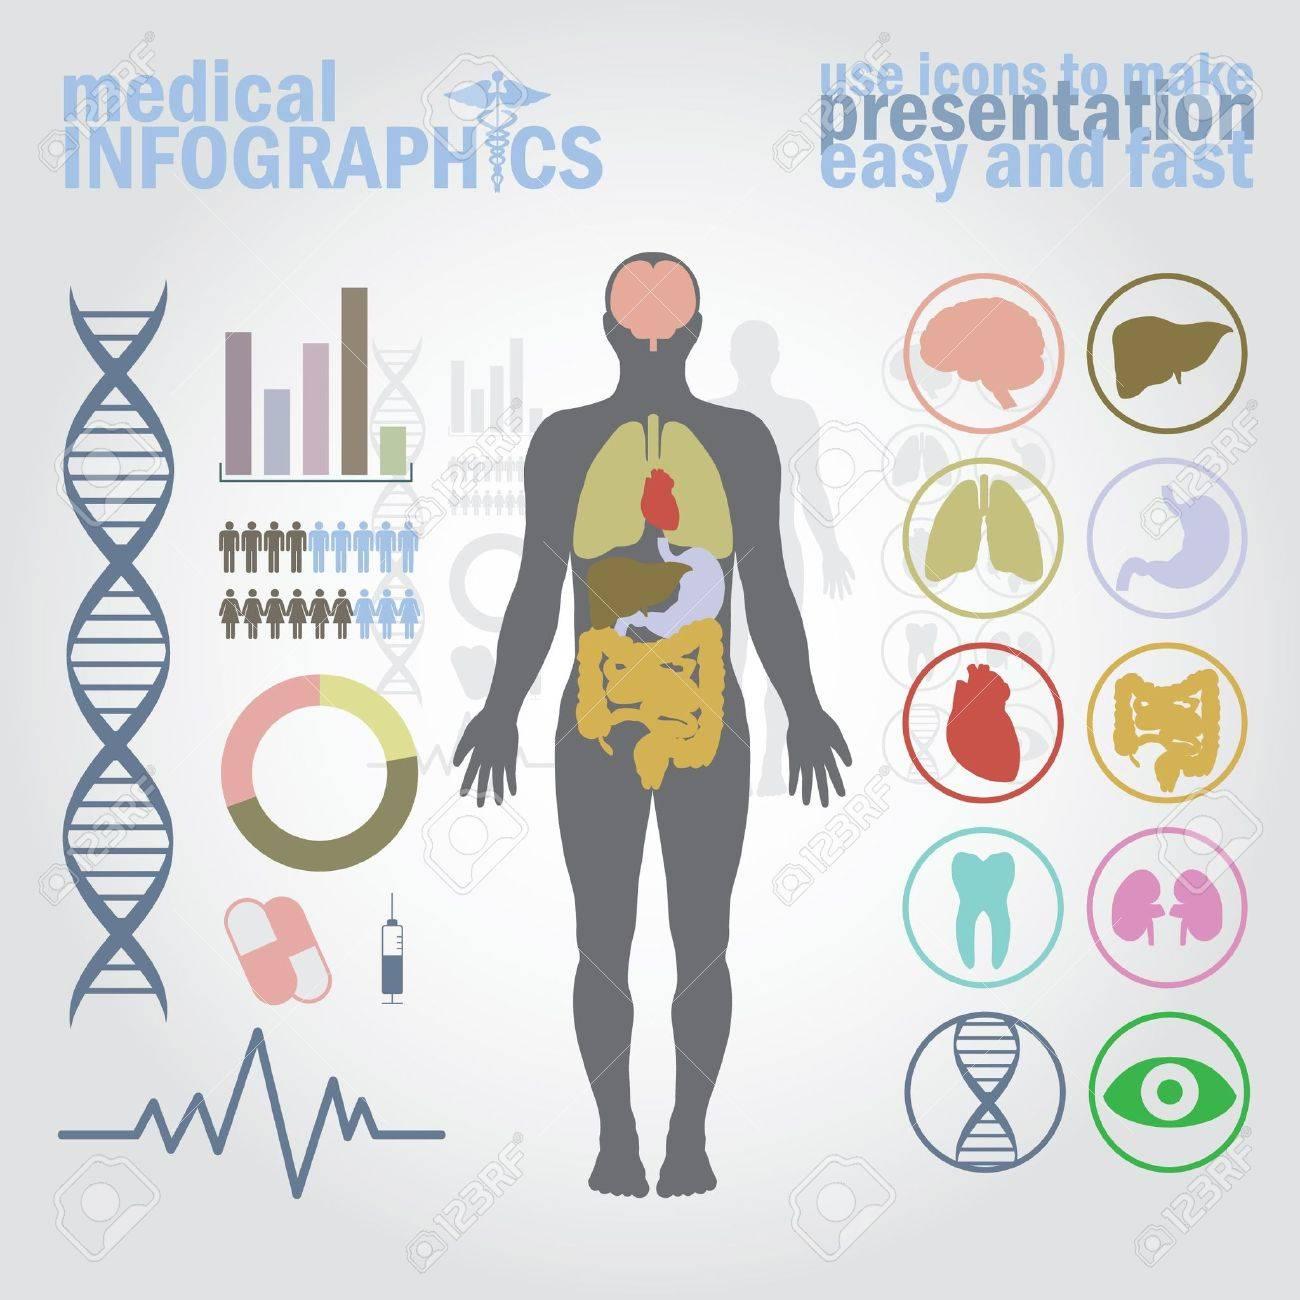 Medical infographics. Presentation set. Human body with internal organs plus buttons. Diagram (graph), cardio gram. - 10775563